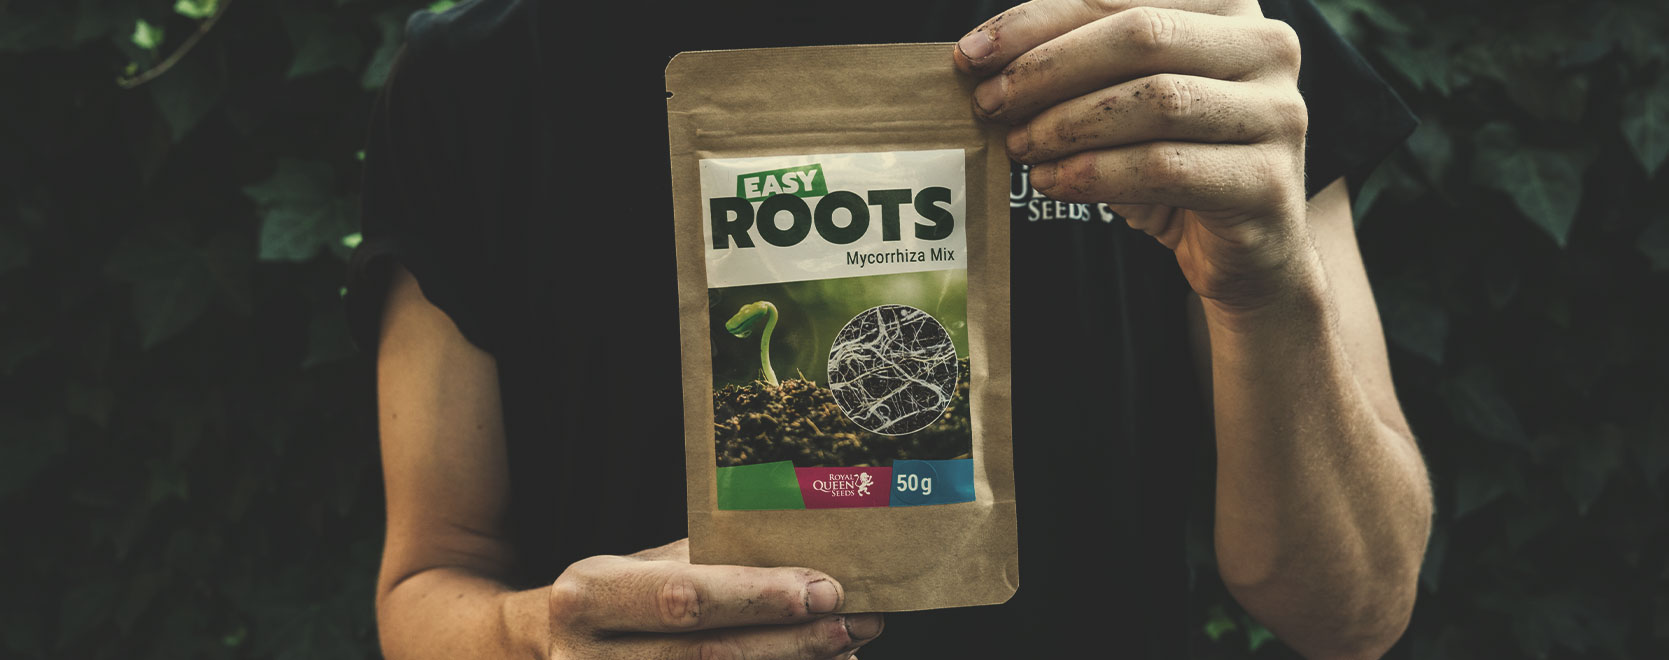 A Few Tips for Your Medical Cannabis Garden or Grow Room